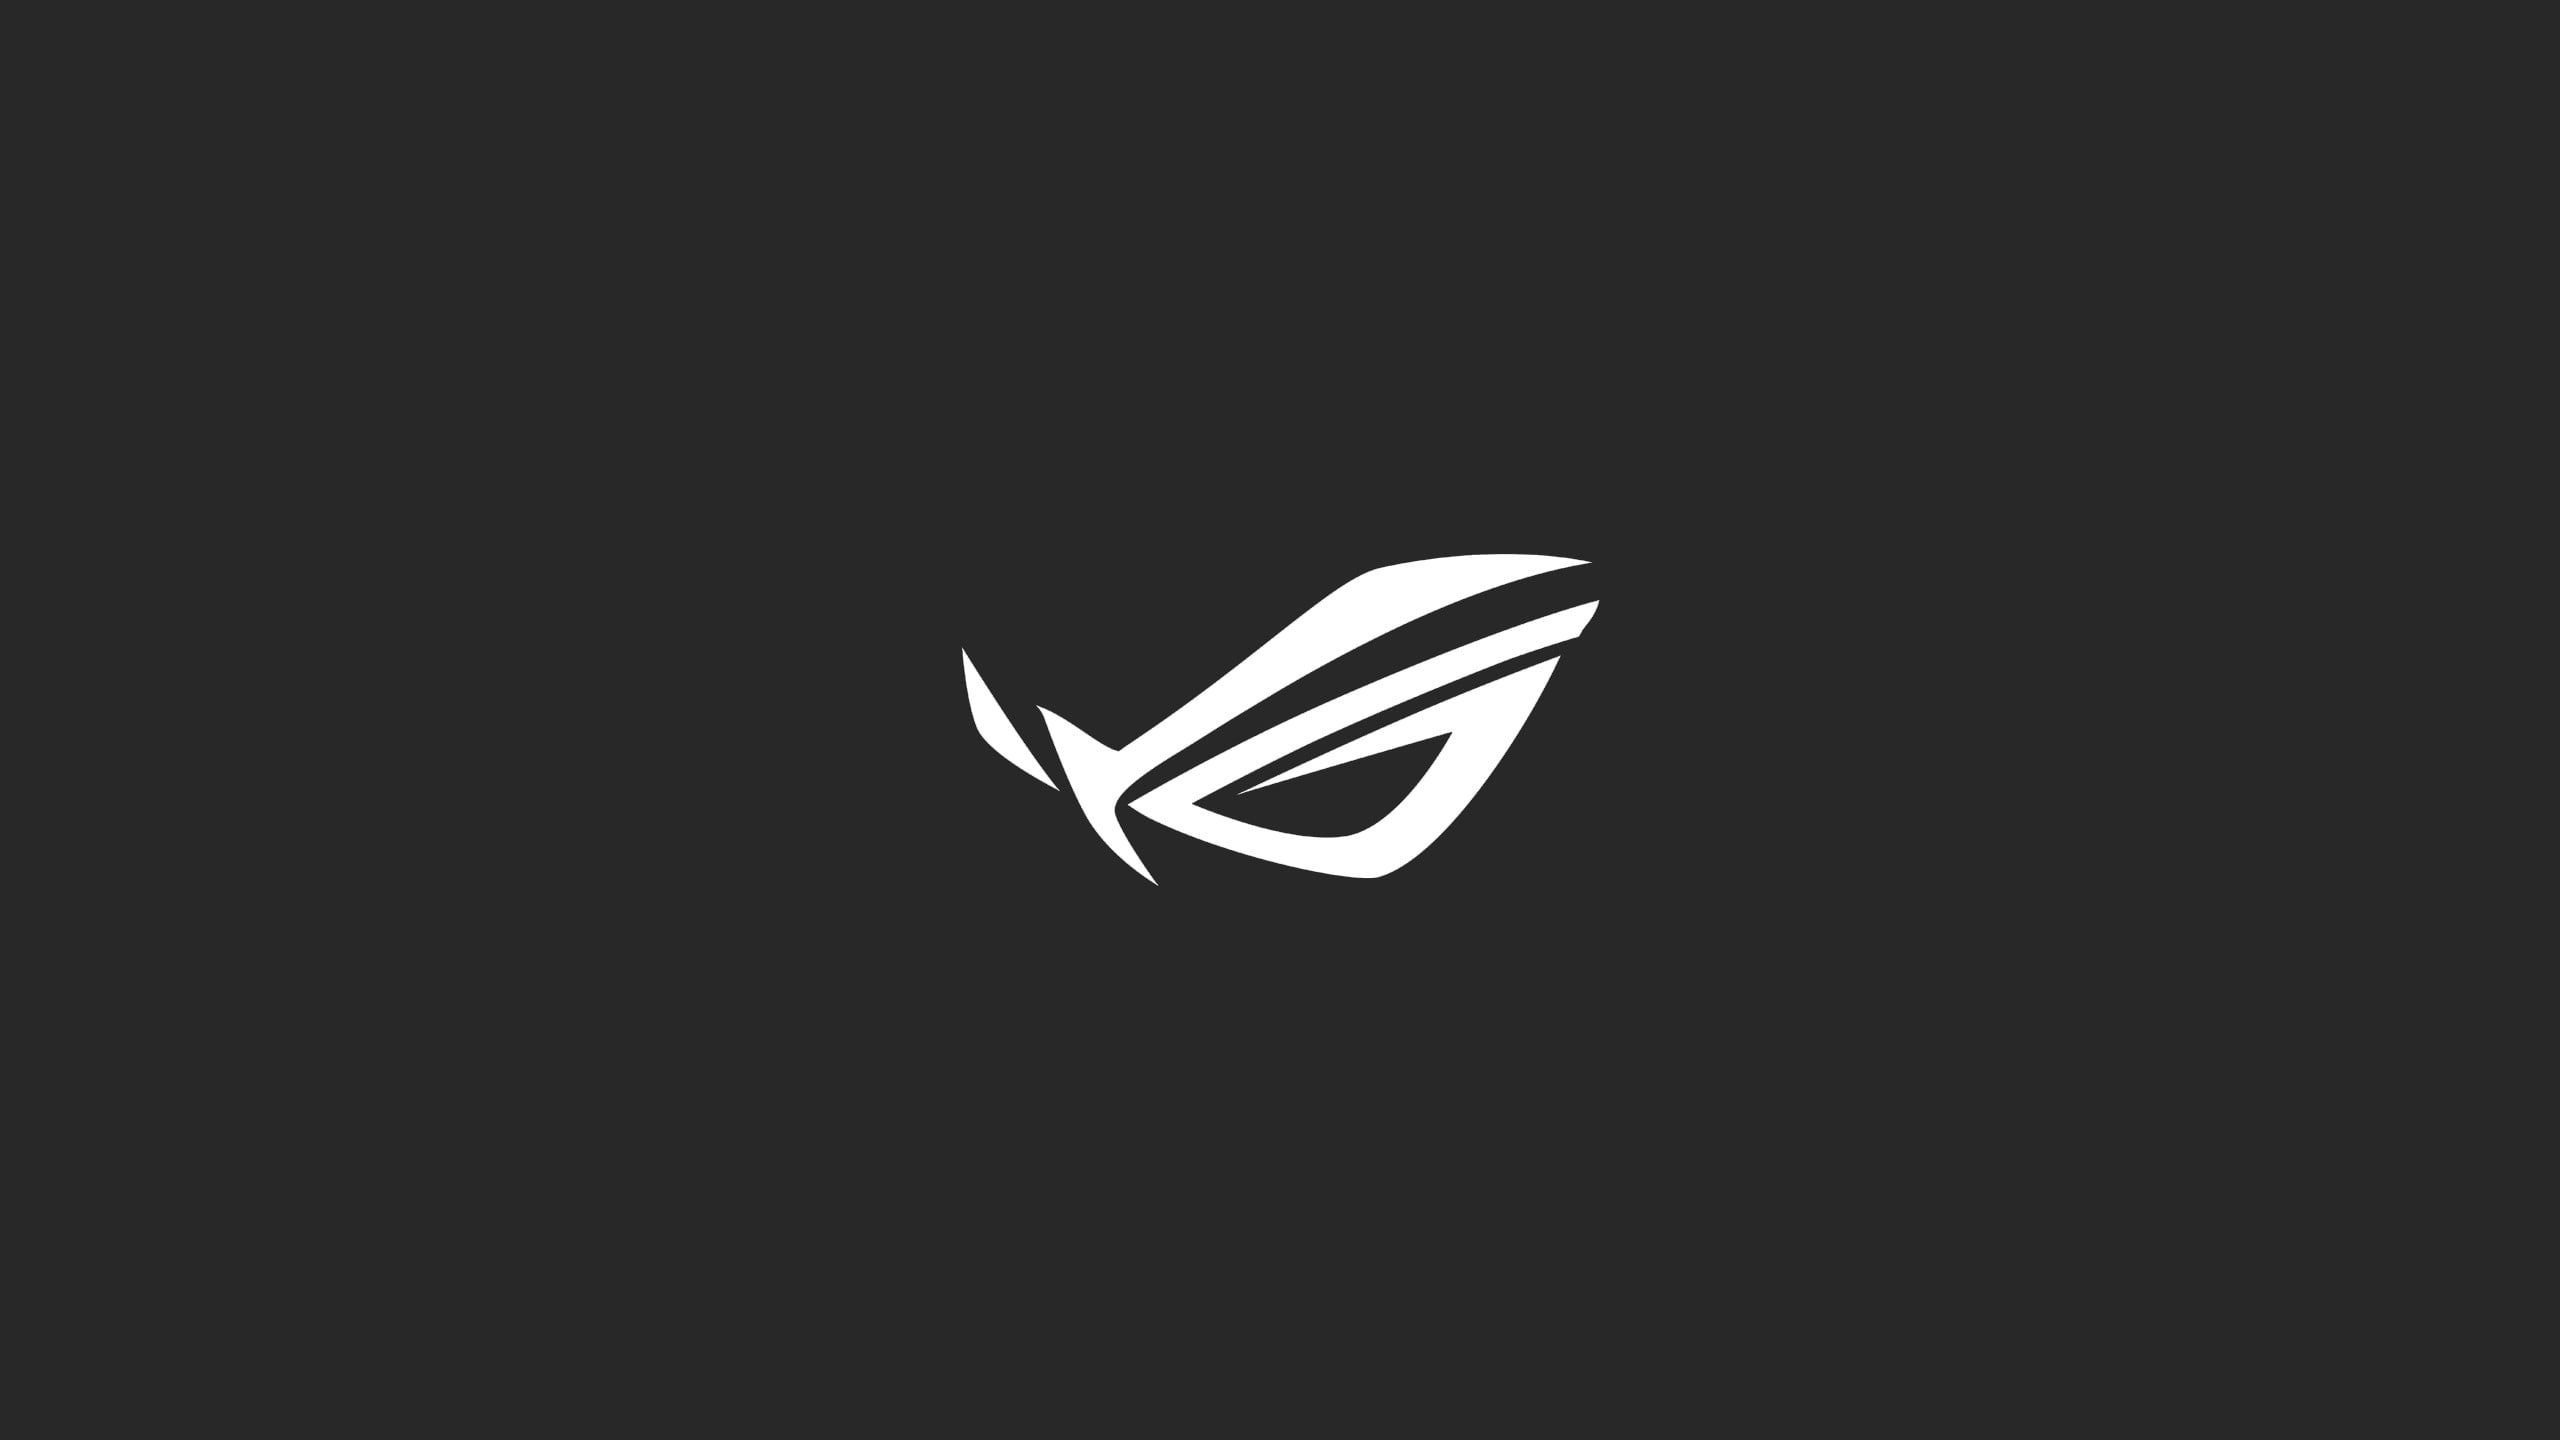 Asus ROG logo ASUS Republic of Gamers minimalism 2K